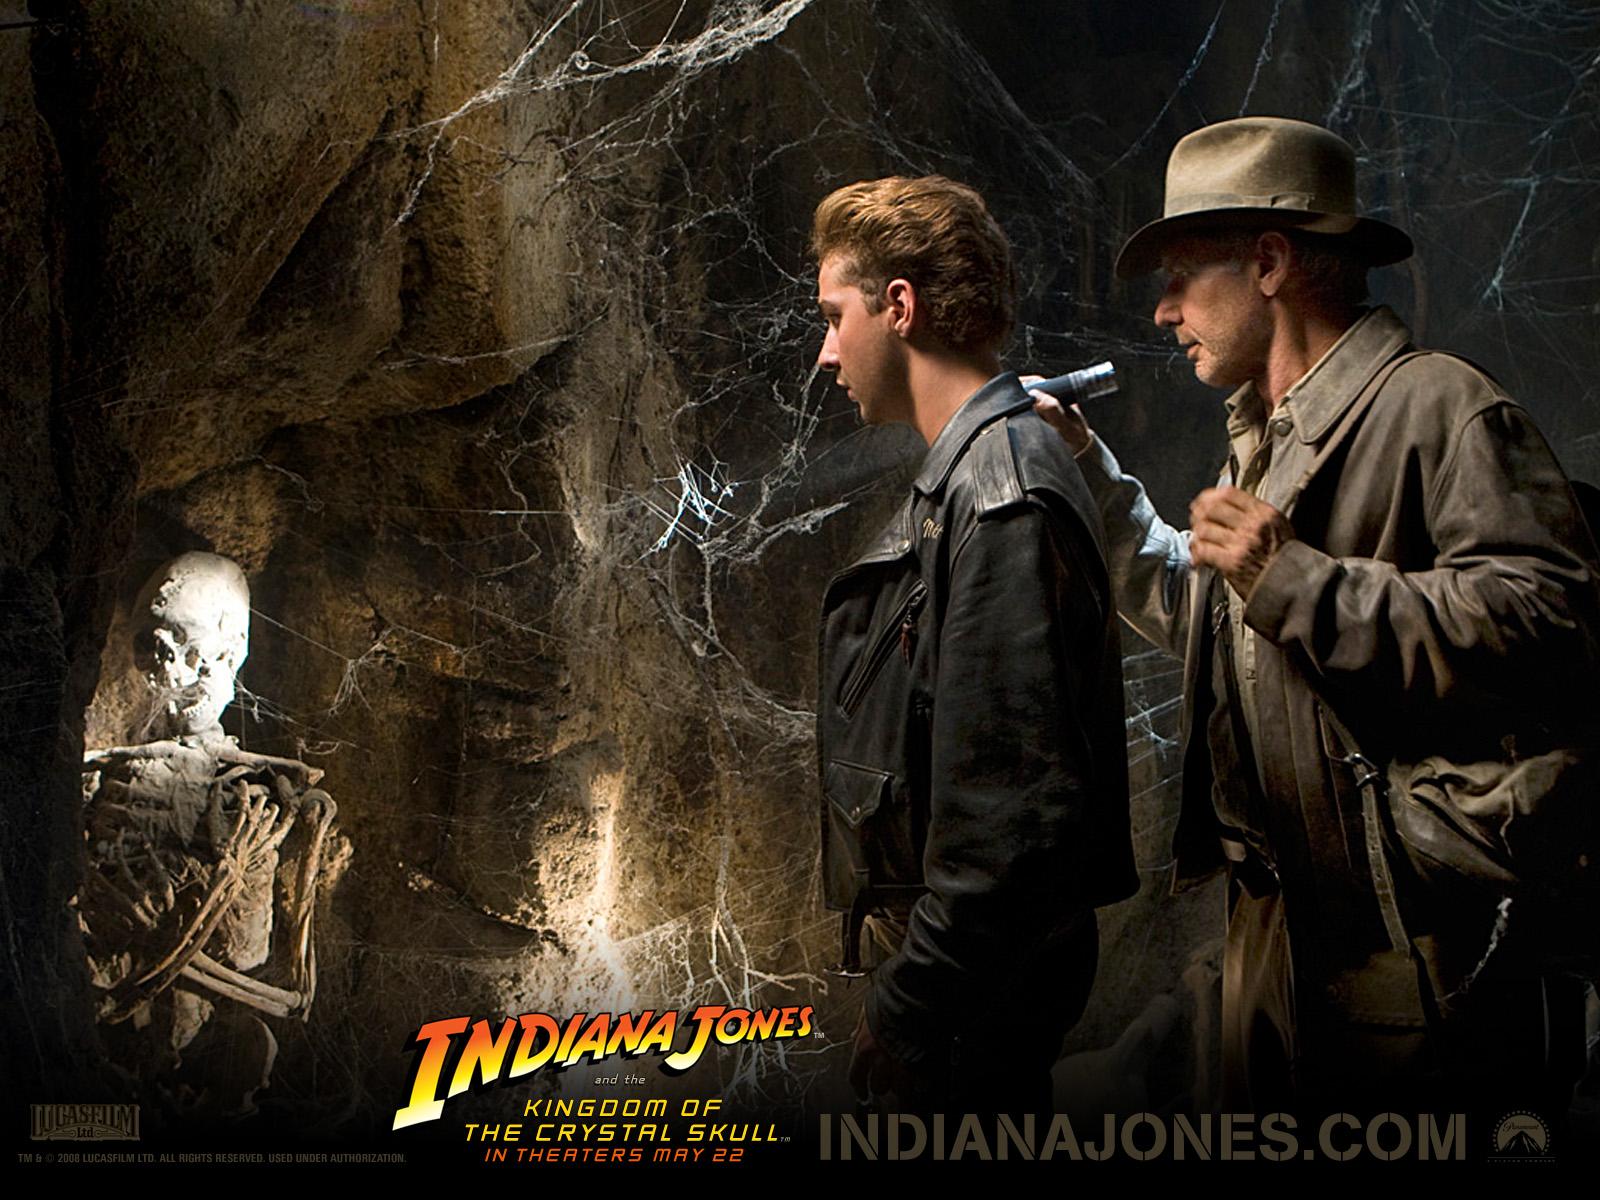 Photo Indiana Jones Indiana Jones and the Kingdom of the Crystal Skull Movies film